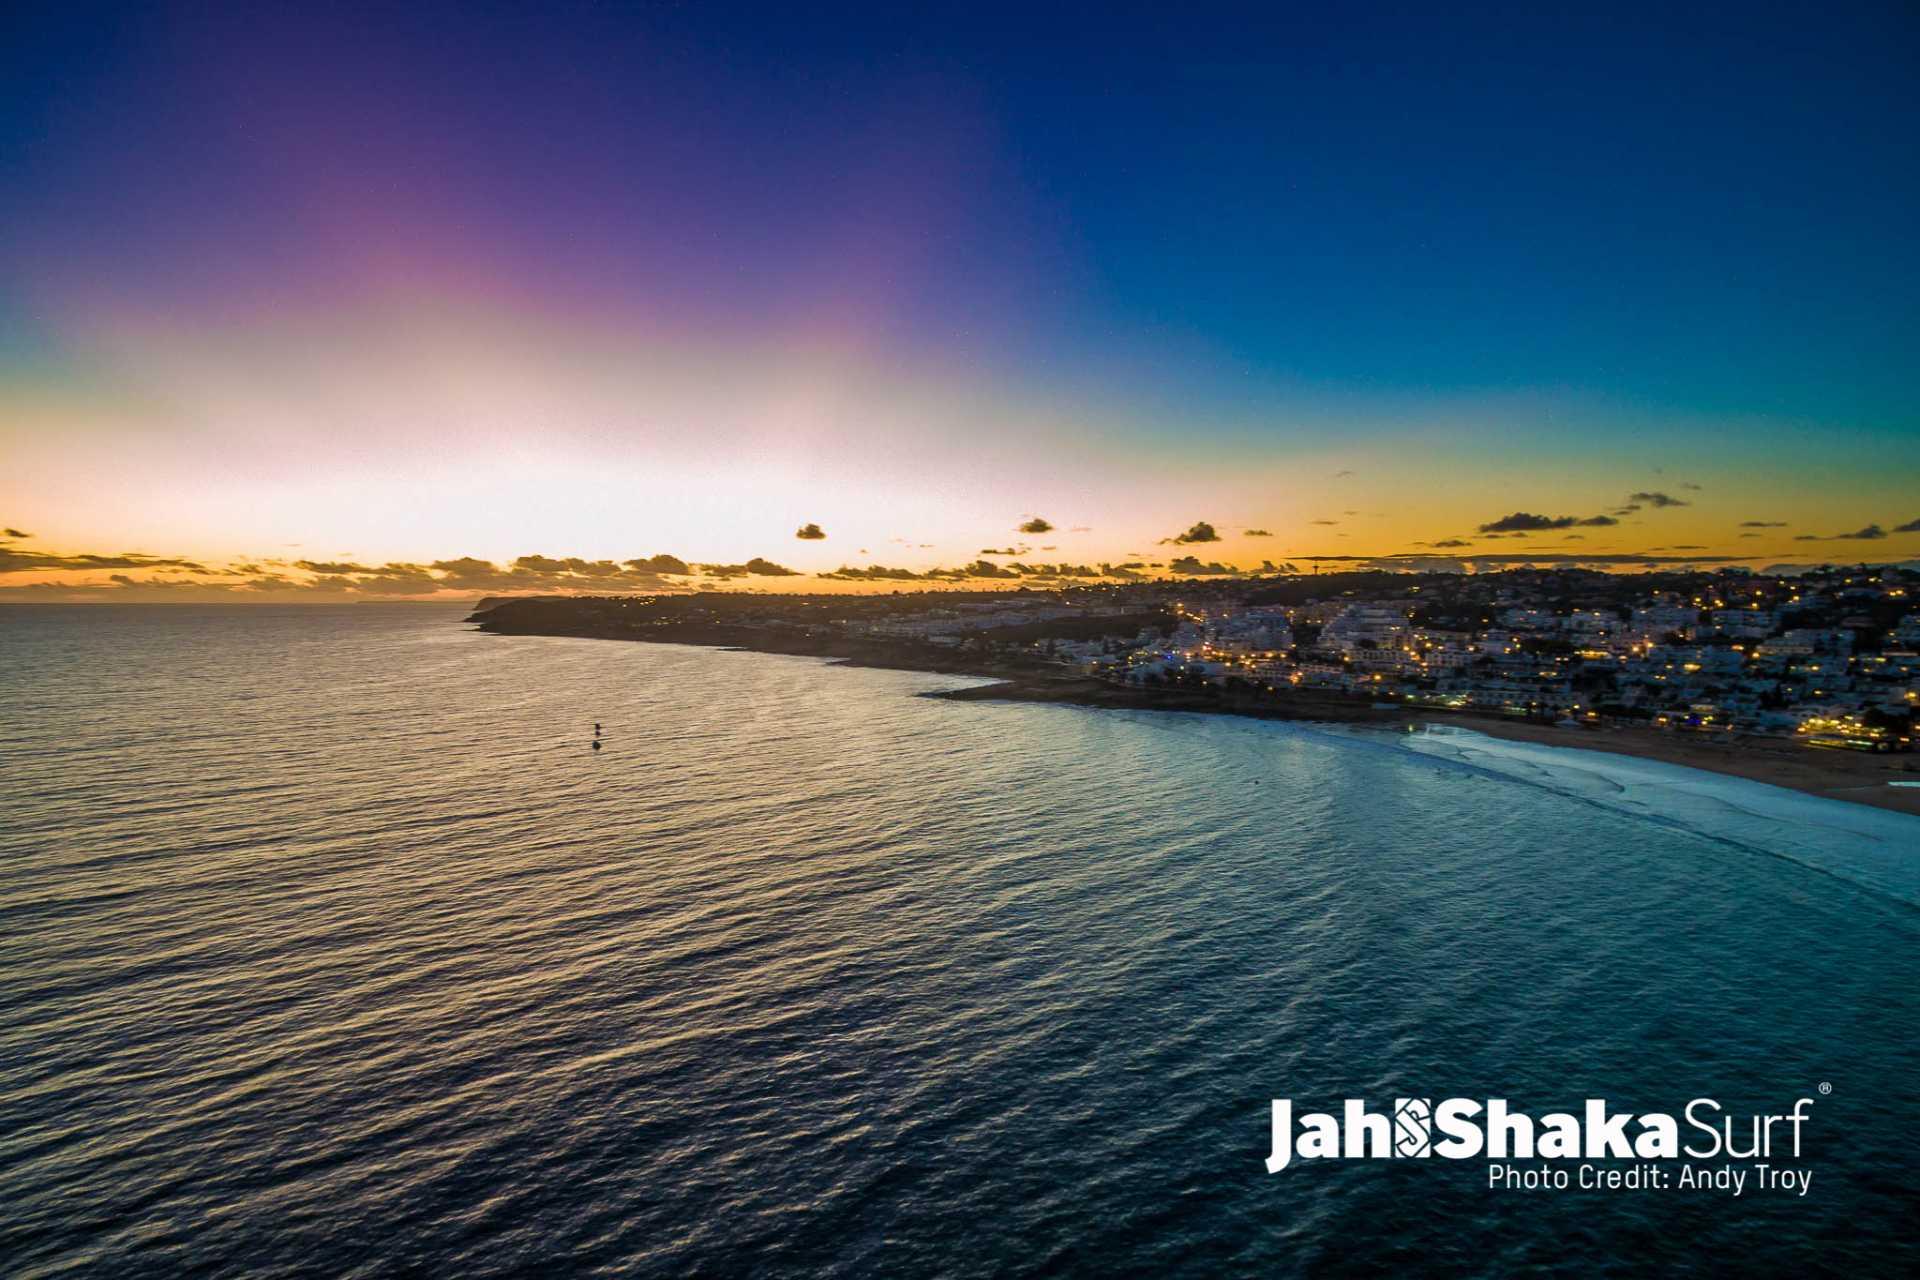 Jah shaka surf roxy week, girls only surf. -2